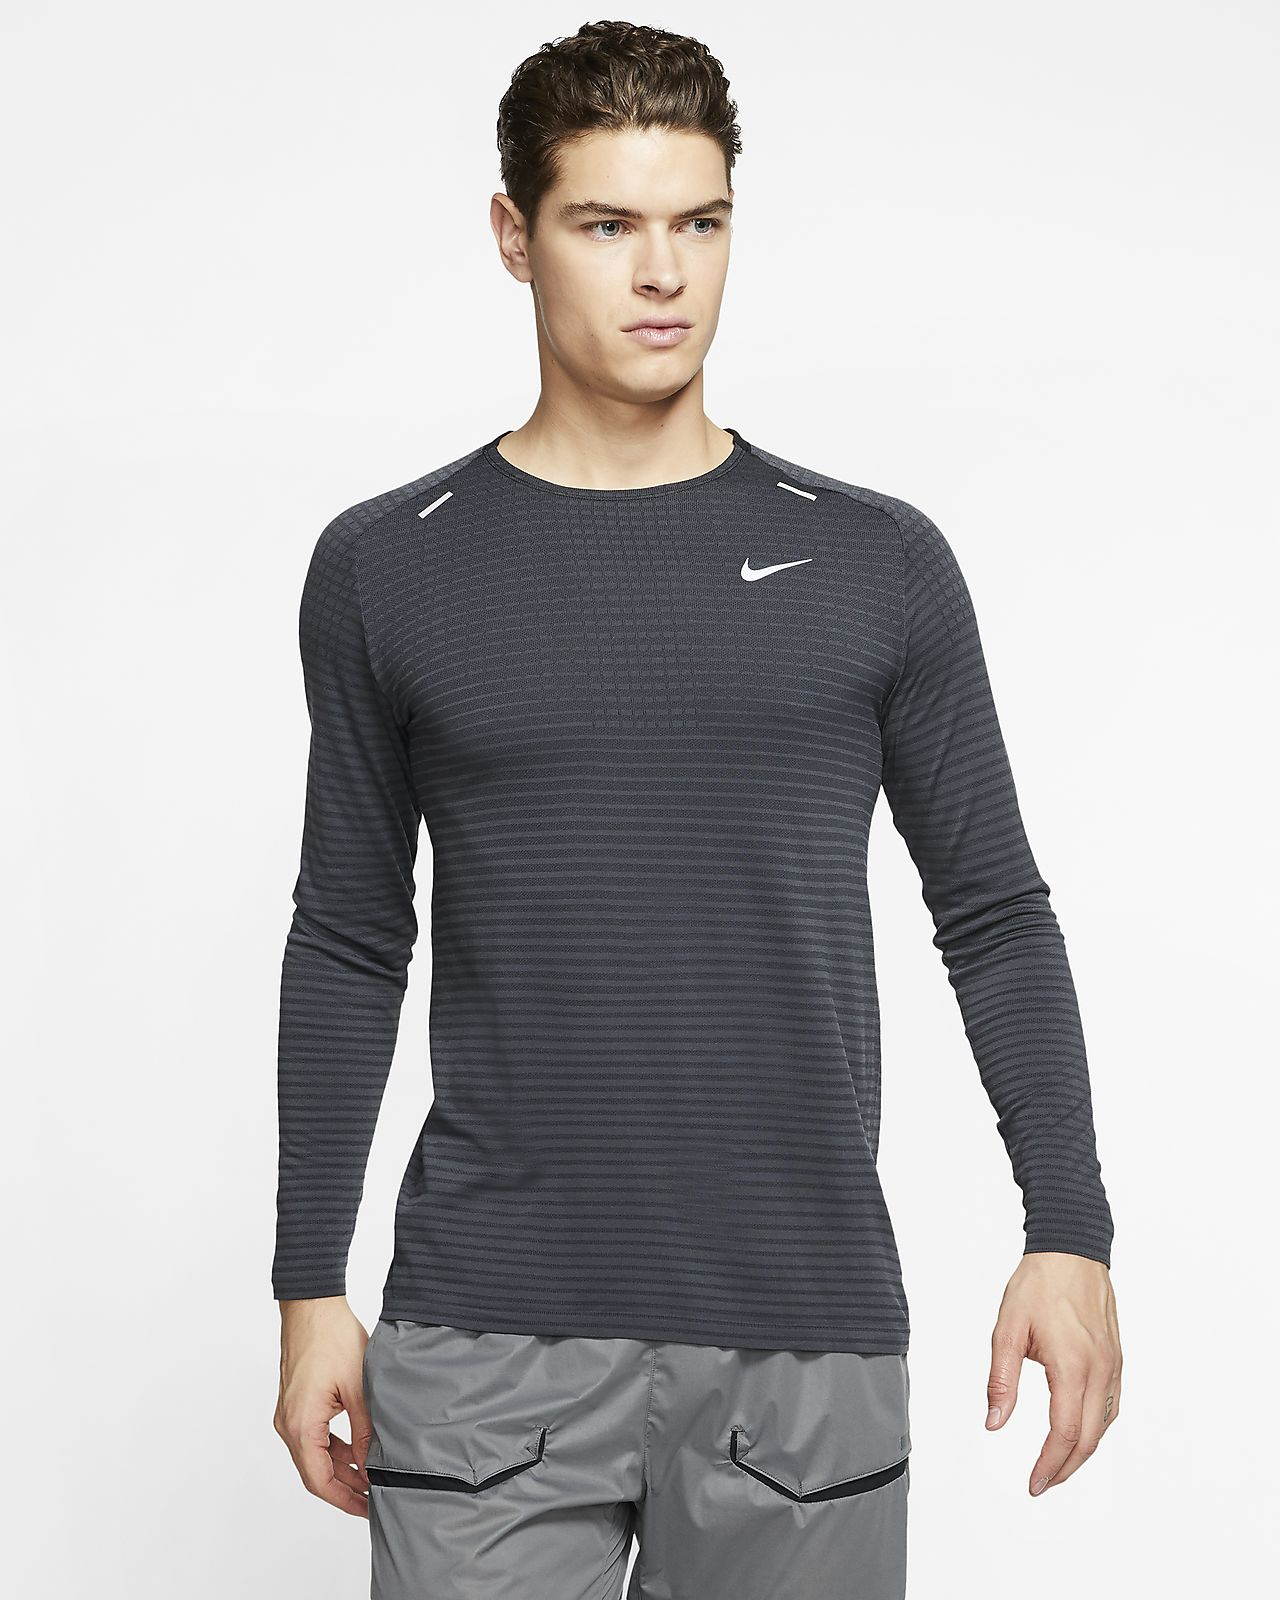 Nike Herre Techknit Ultra T Shirt